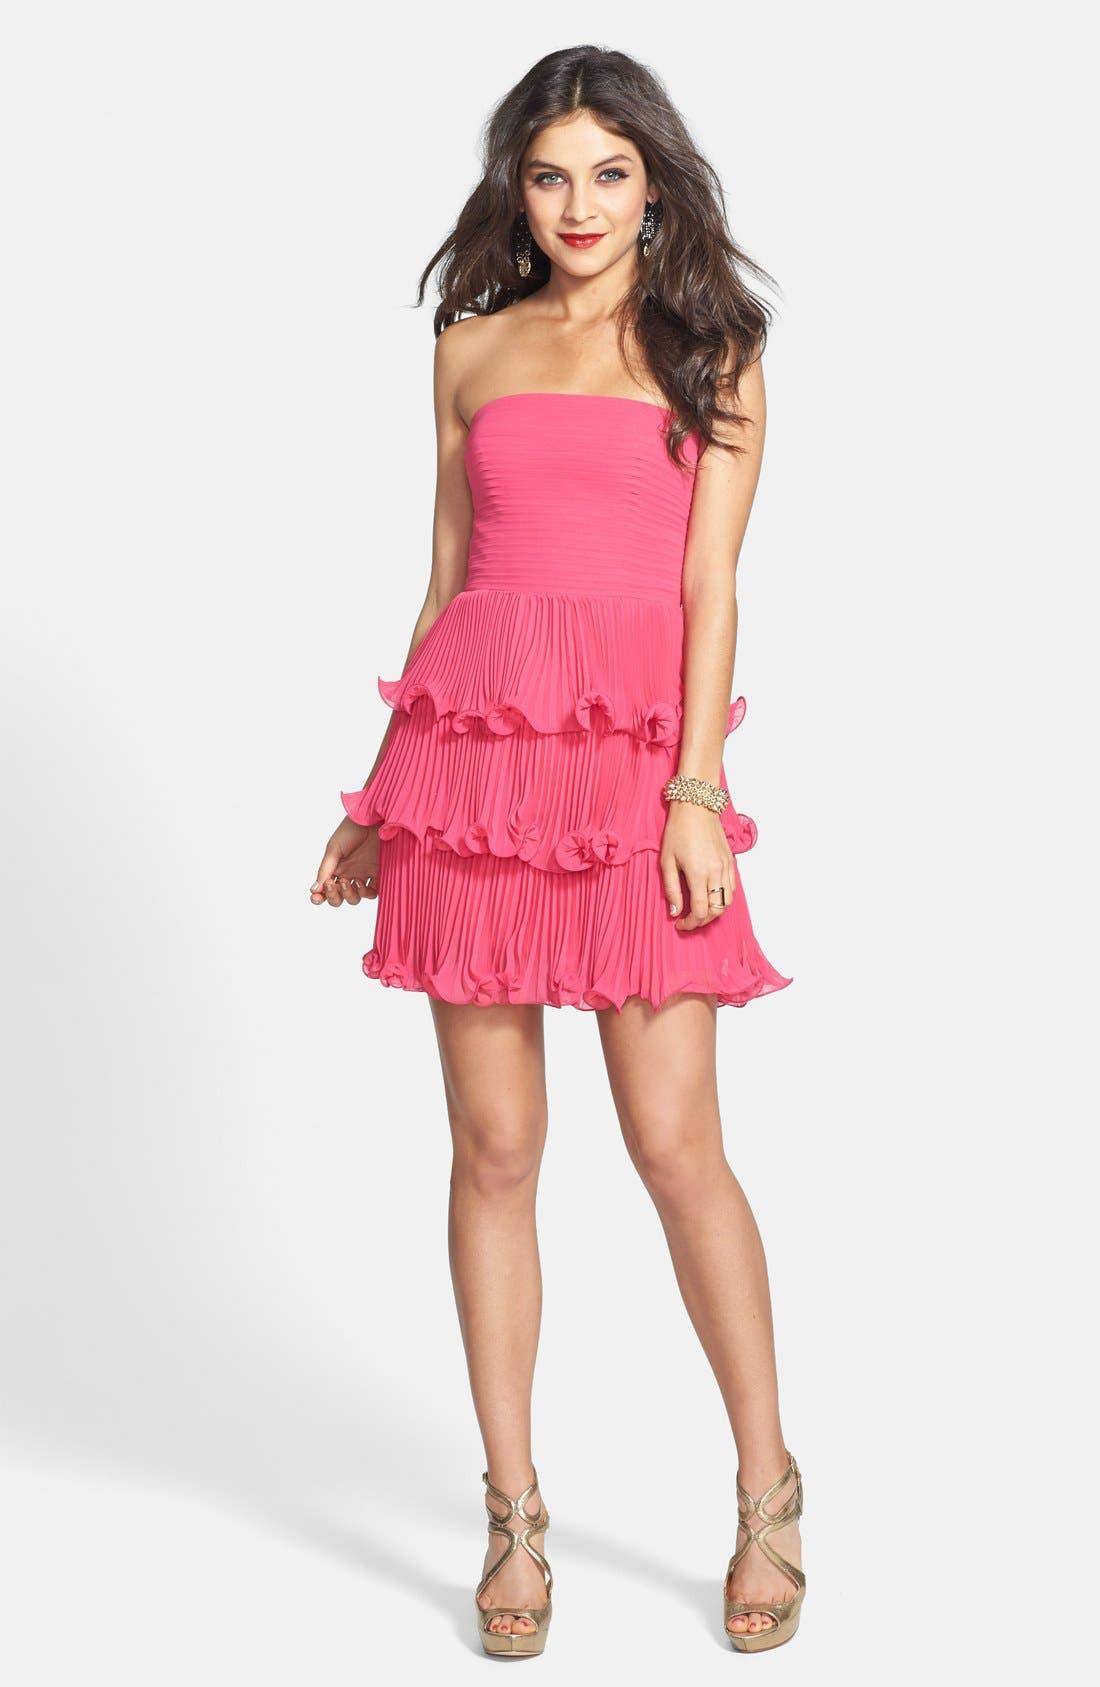 Alternate Image 1 Selected - ERIN erin fetherston 'Sweet Pea' Chiffon Dress